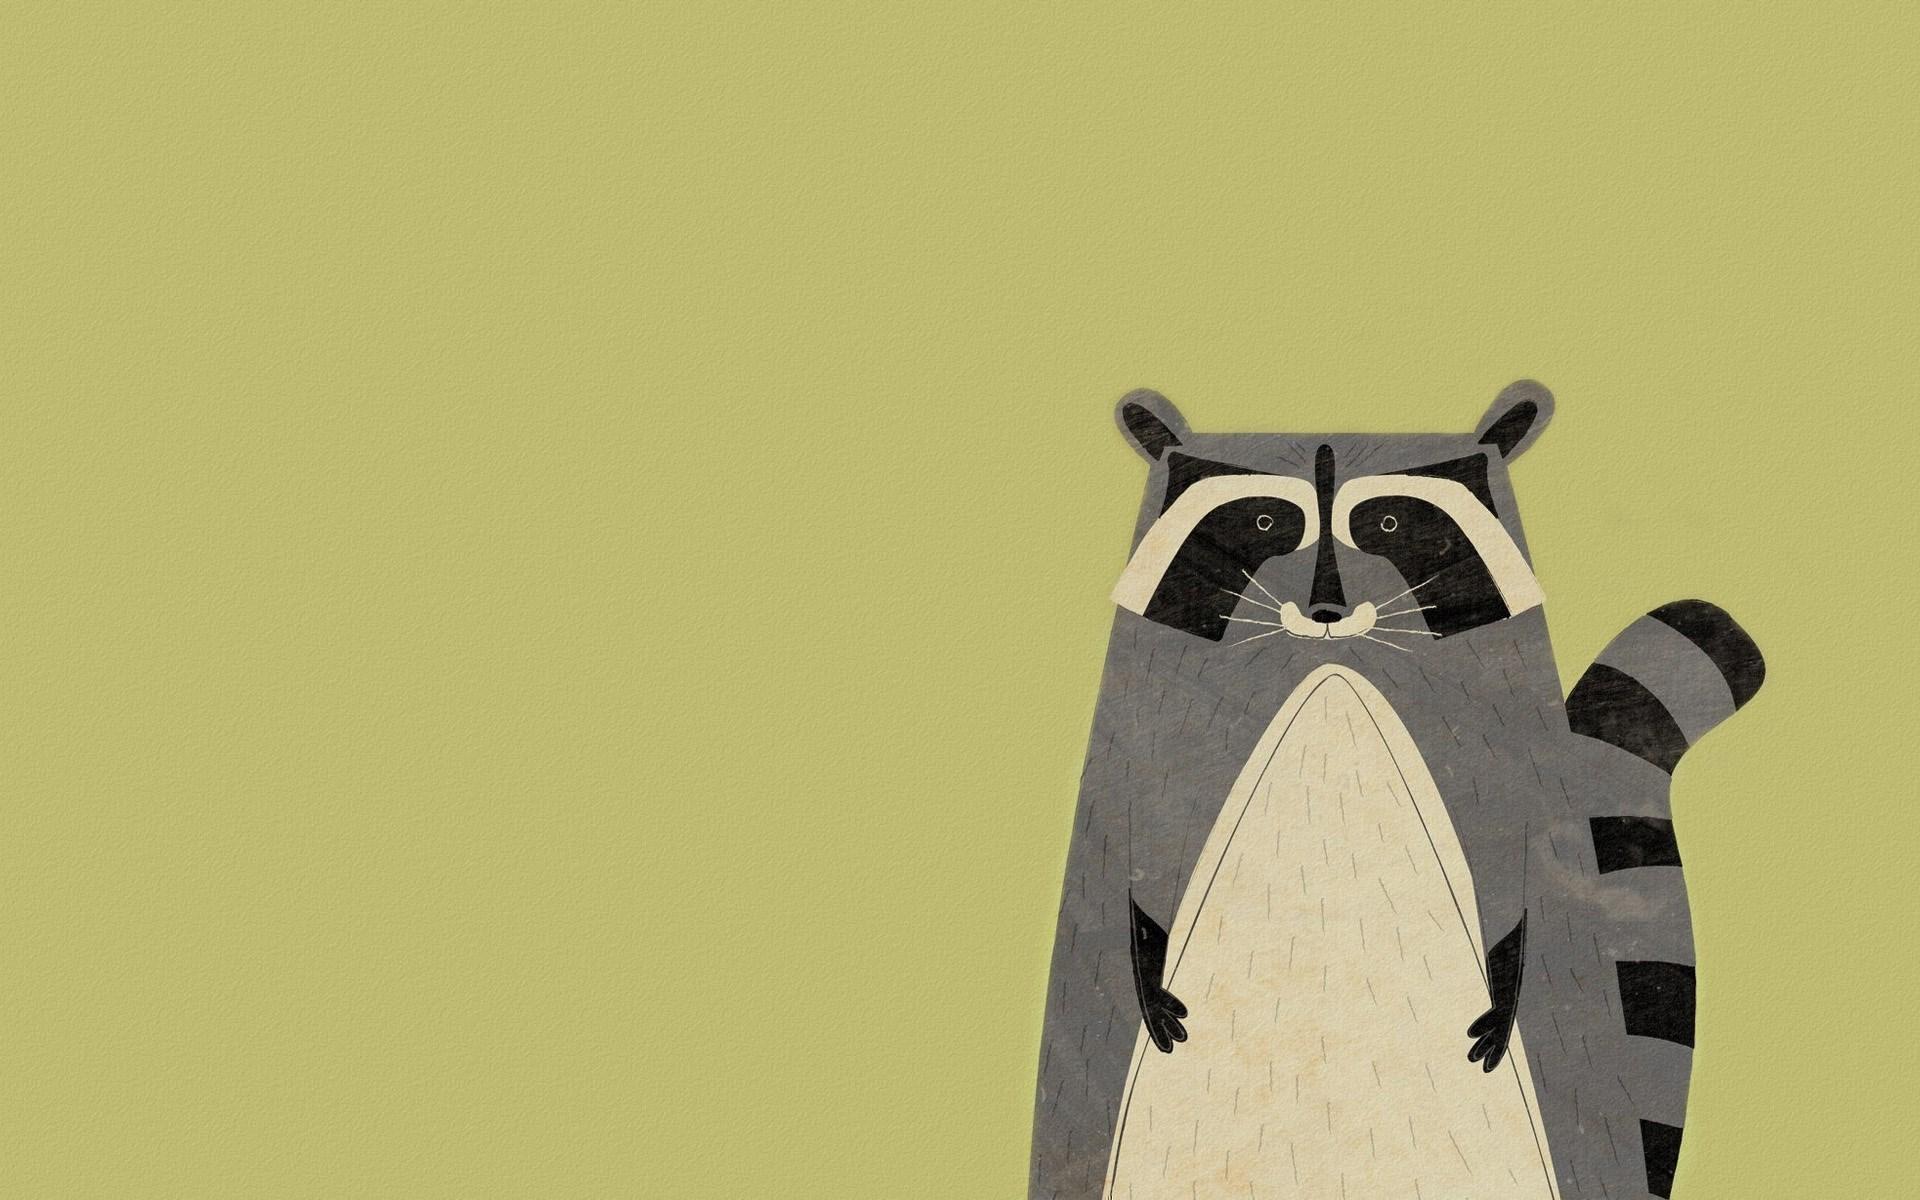 Animal Raccoon Minimalism Art